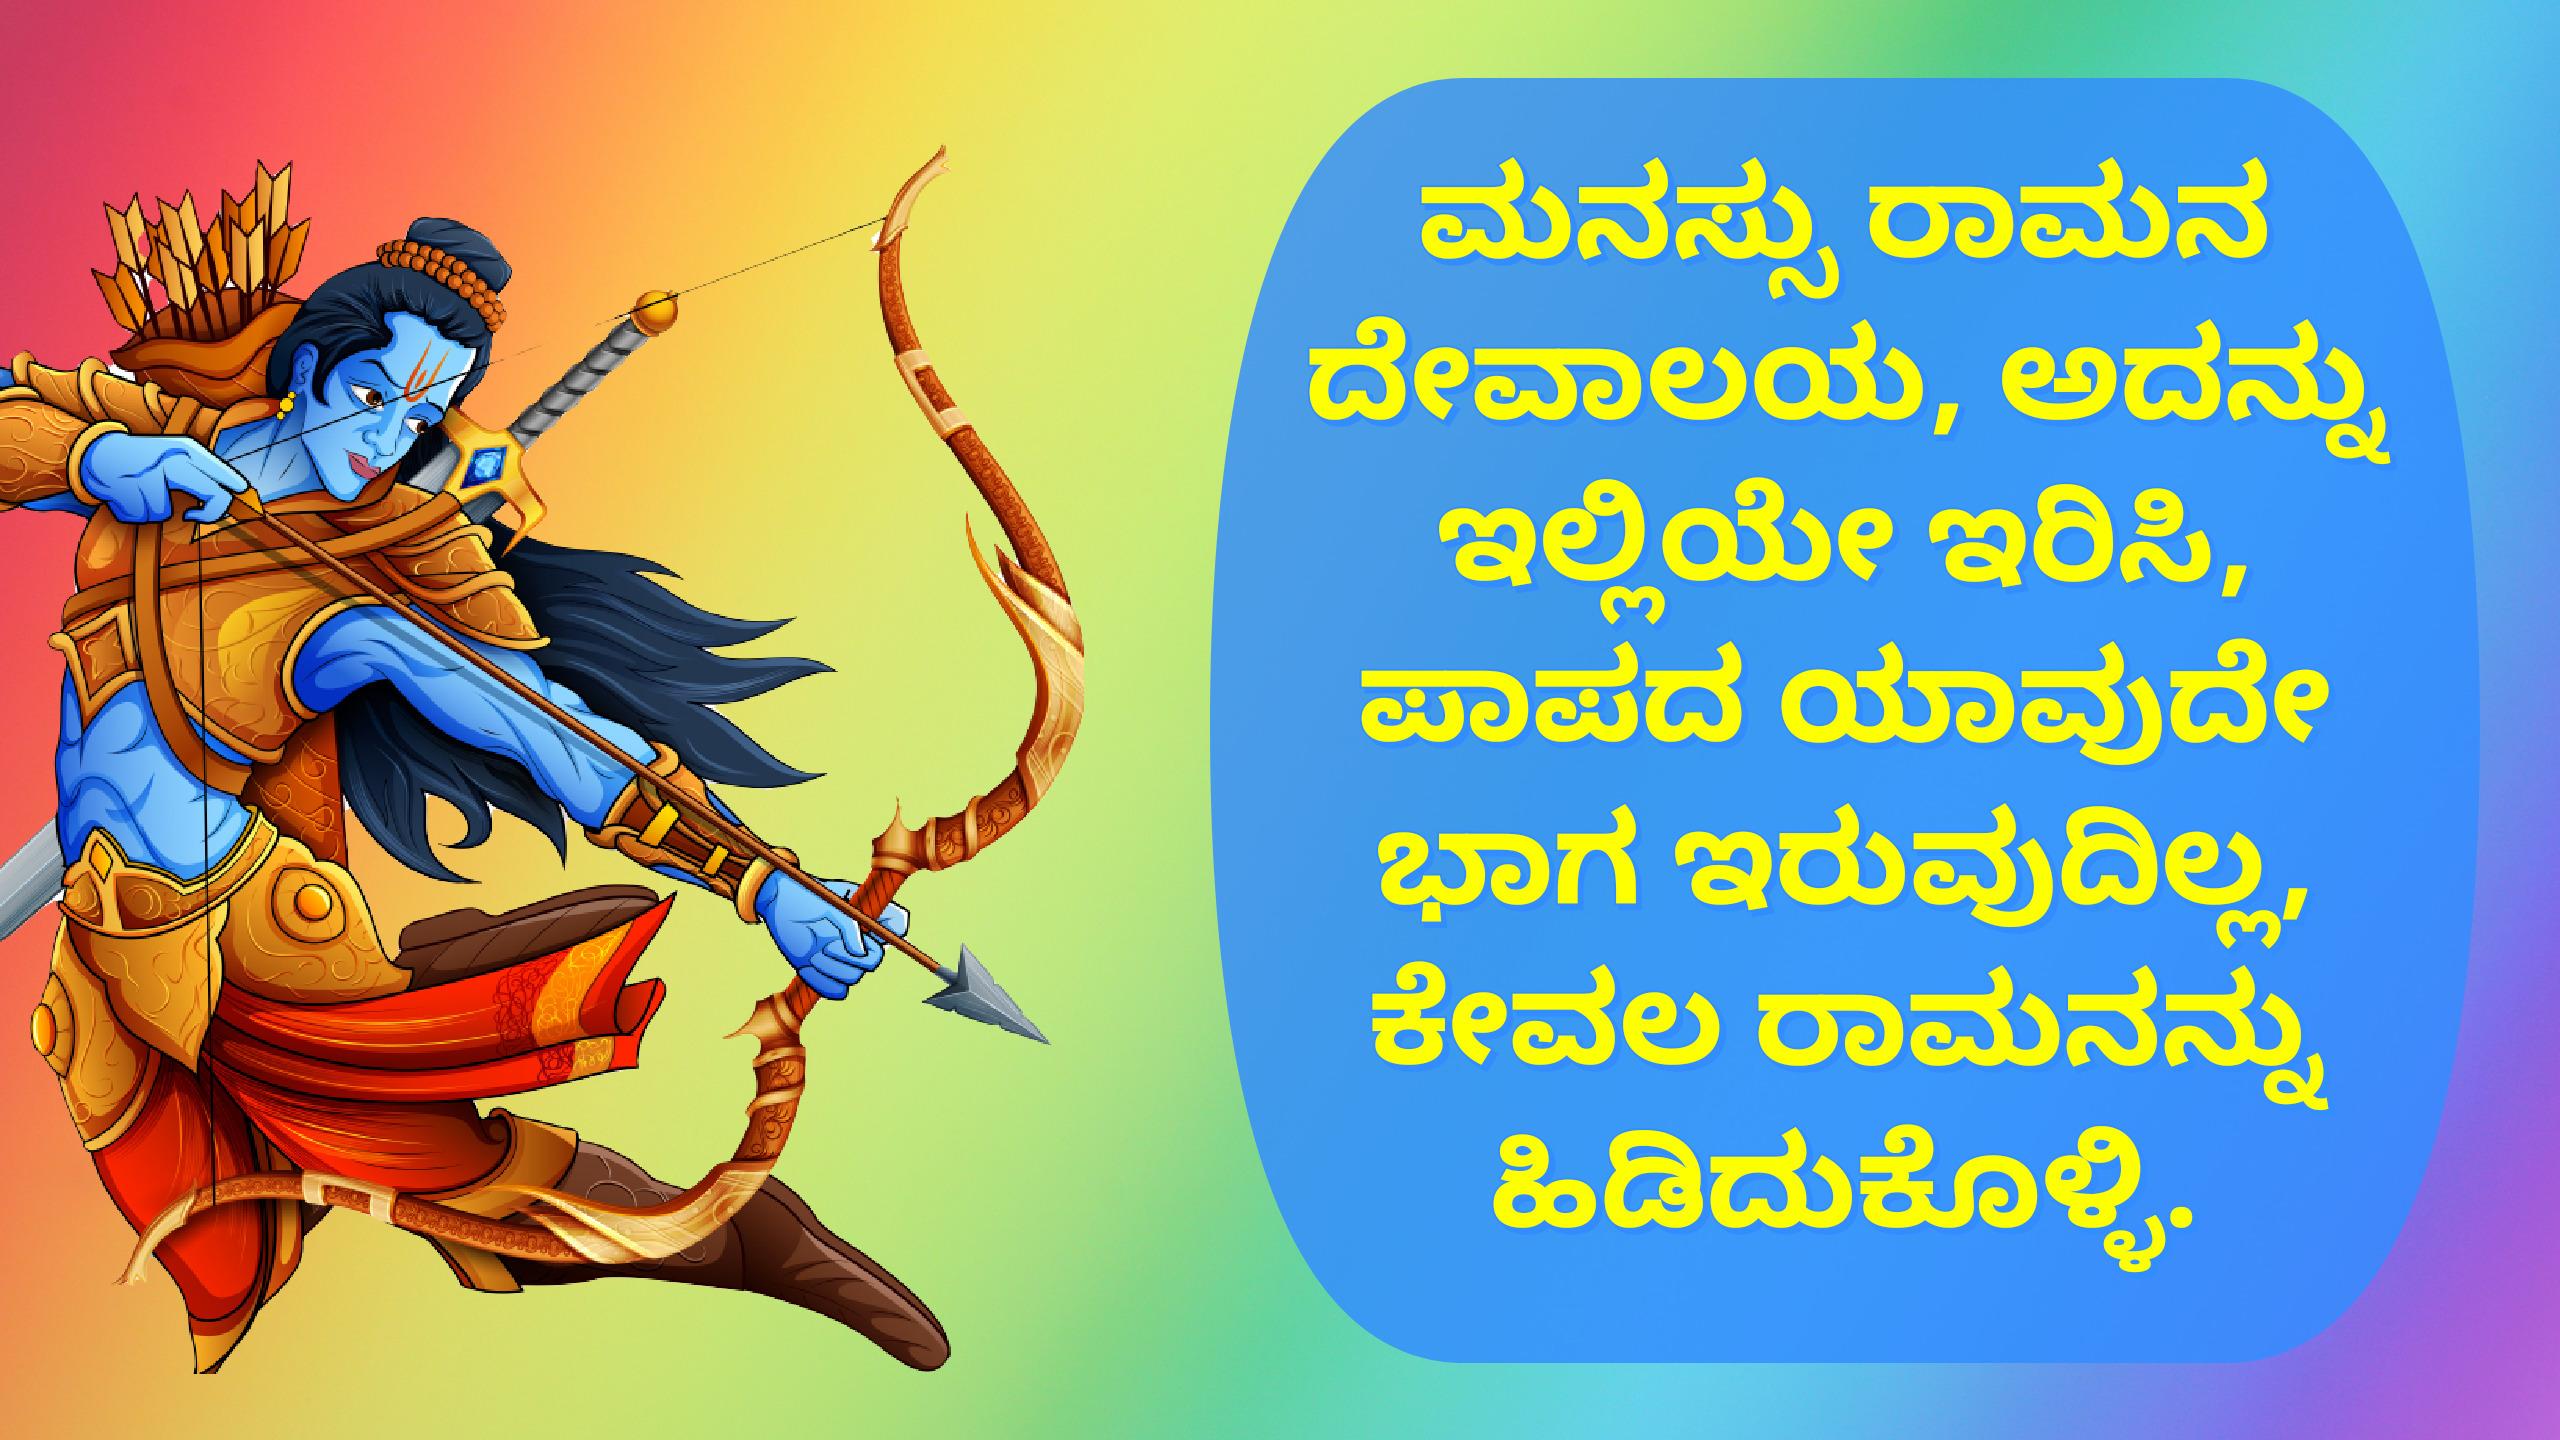 15. Shree Ram Quotes in Kannada